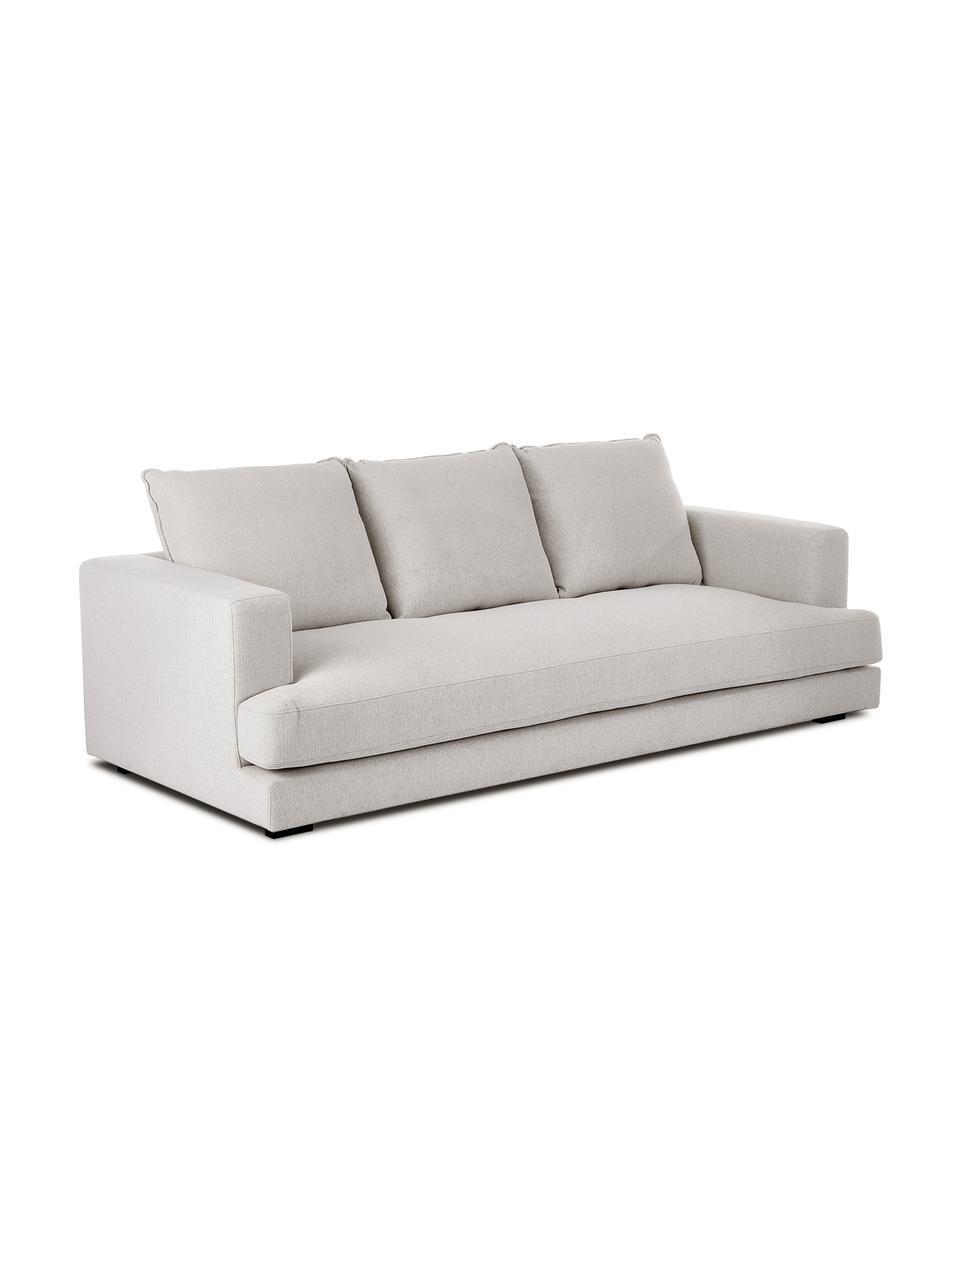 Sofa Tribeca (3-Sitzer) in Beigegrau, Bezug: Polyester Der hochwertige, Gestell: Massives Kiefernholz, Füße: Massives Buchenholz, lack, Webstoff Beigegrau, B 228 x T 104 cm